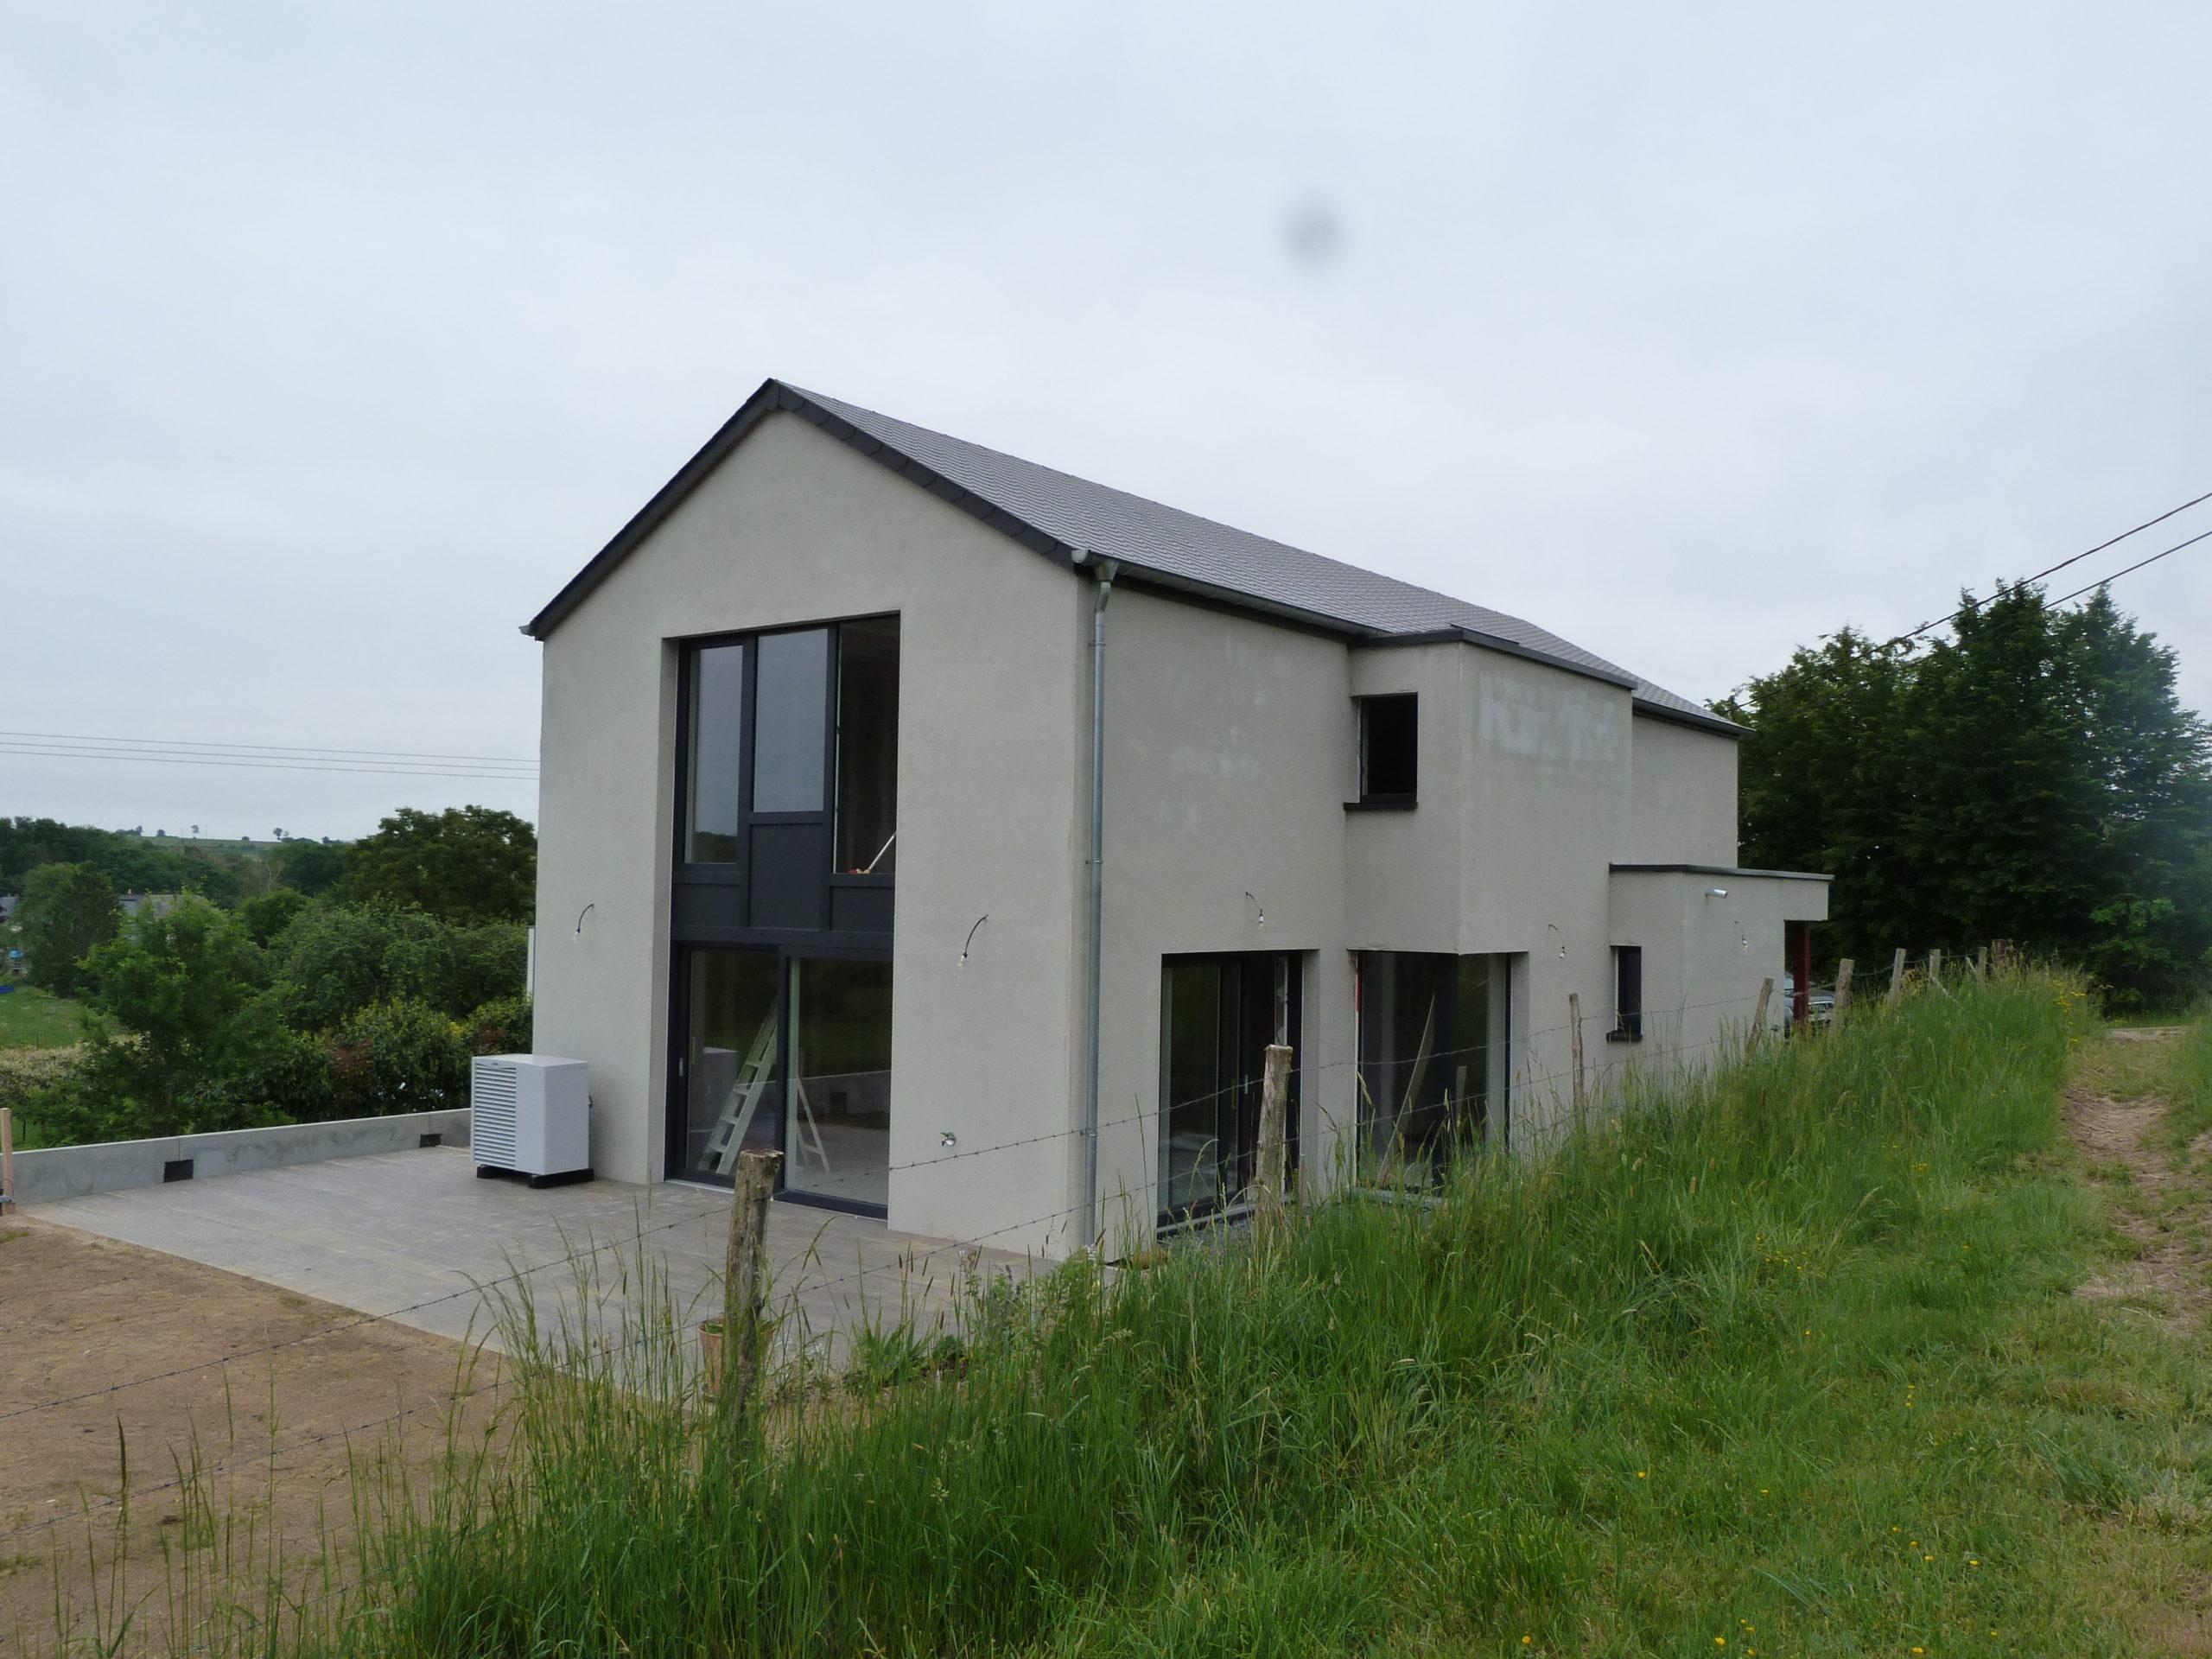 Maison 4 façades à Gomery 3 scaled